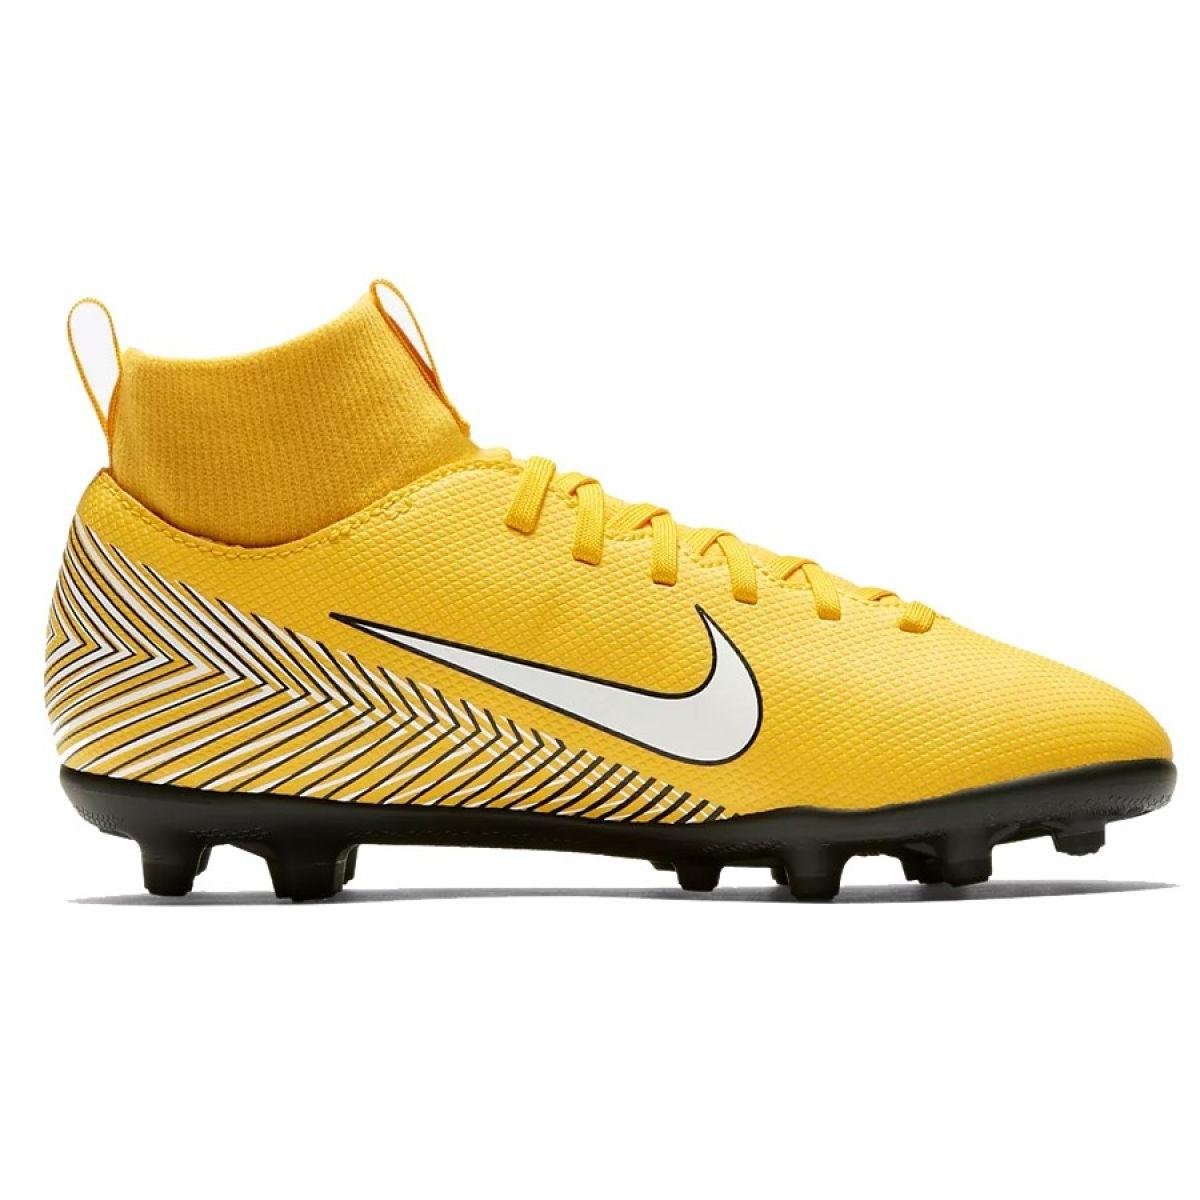 new product f5064 318e6 Nike Mercurial Superfly 6 Club Fußballschuhe Neymar Mg Jr AO2888-710